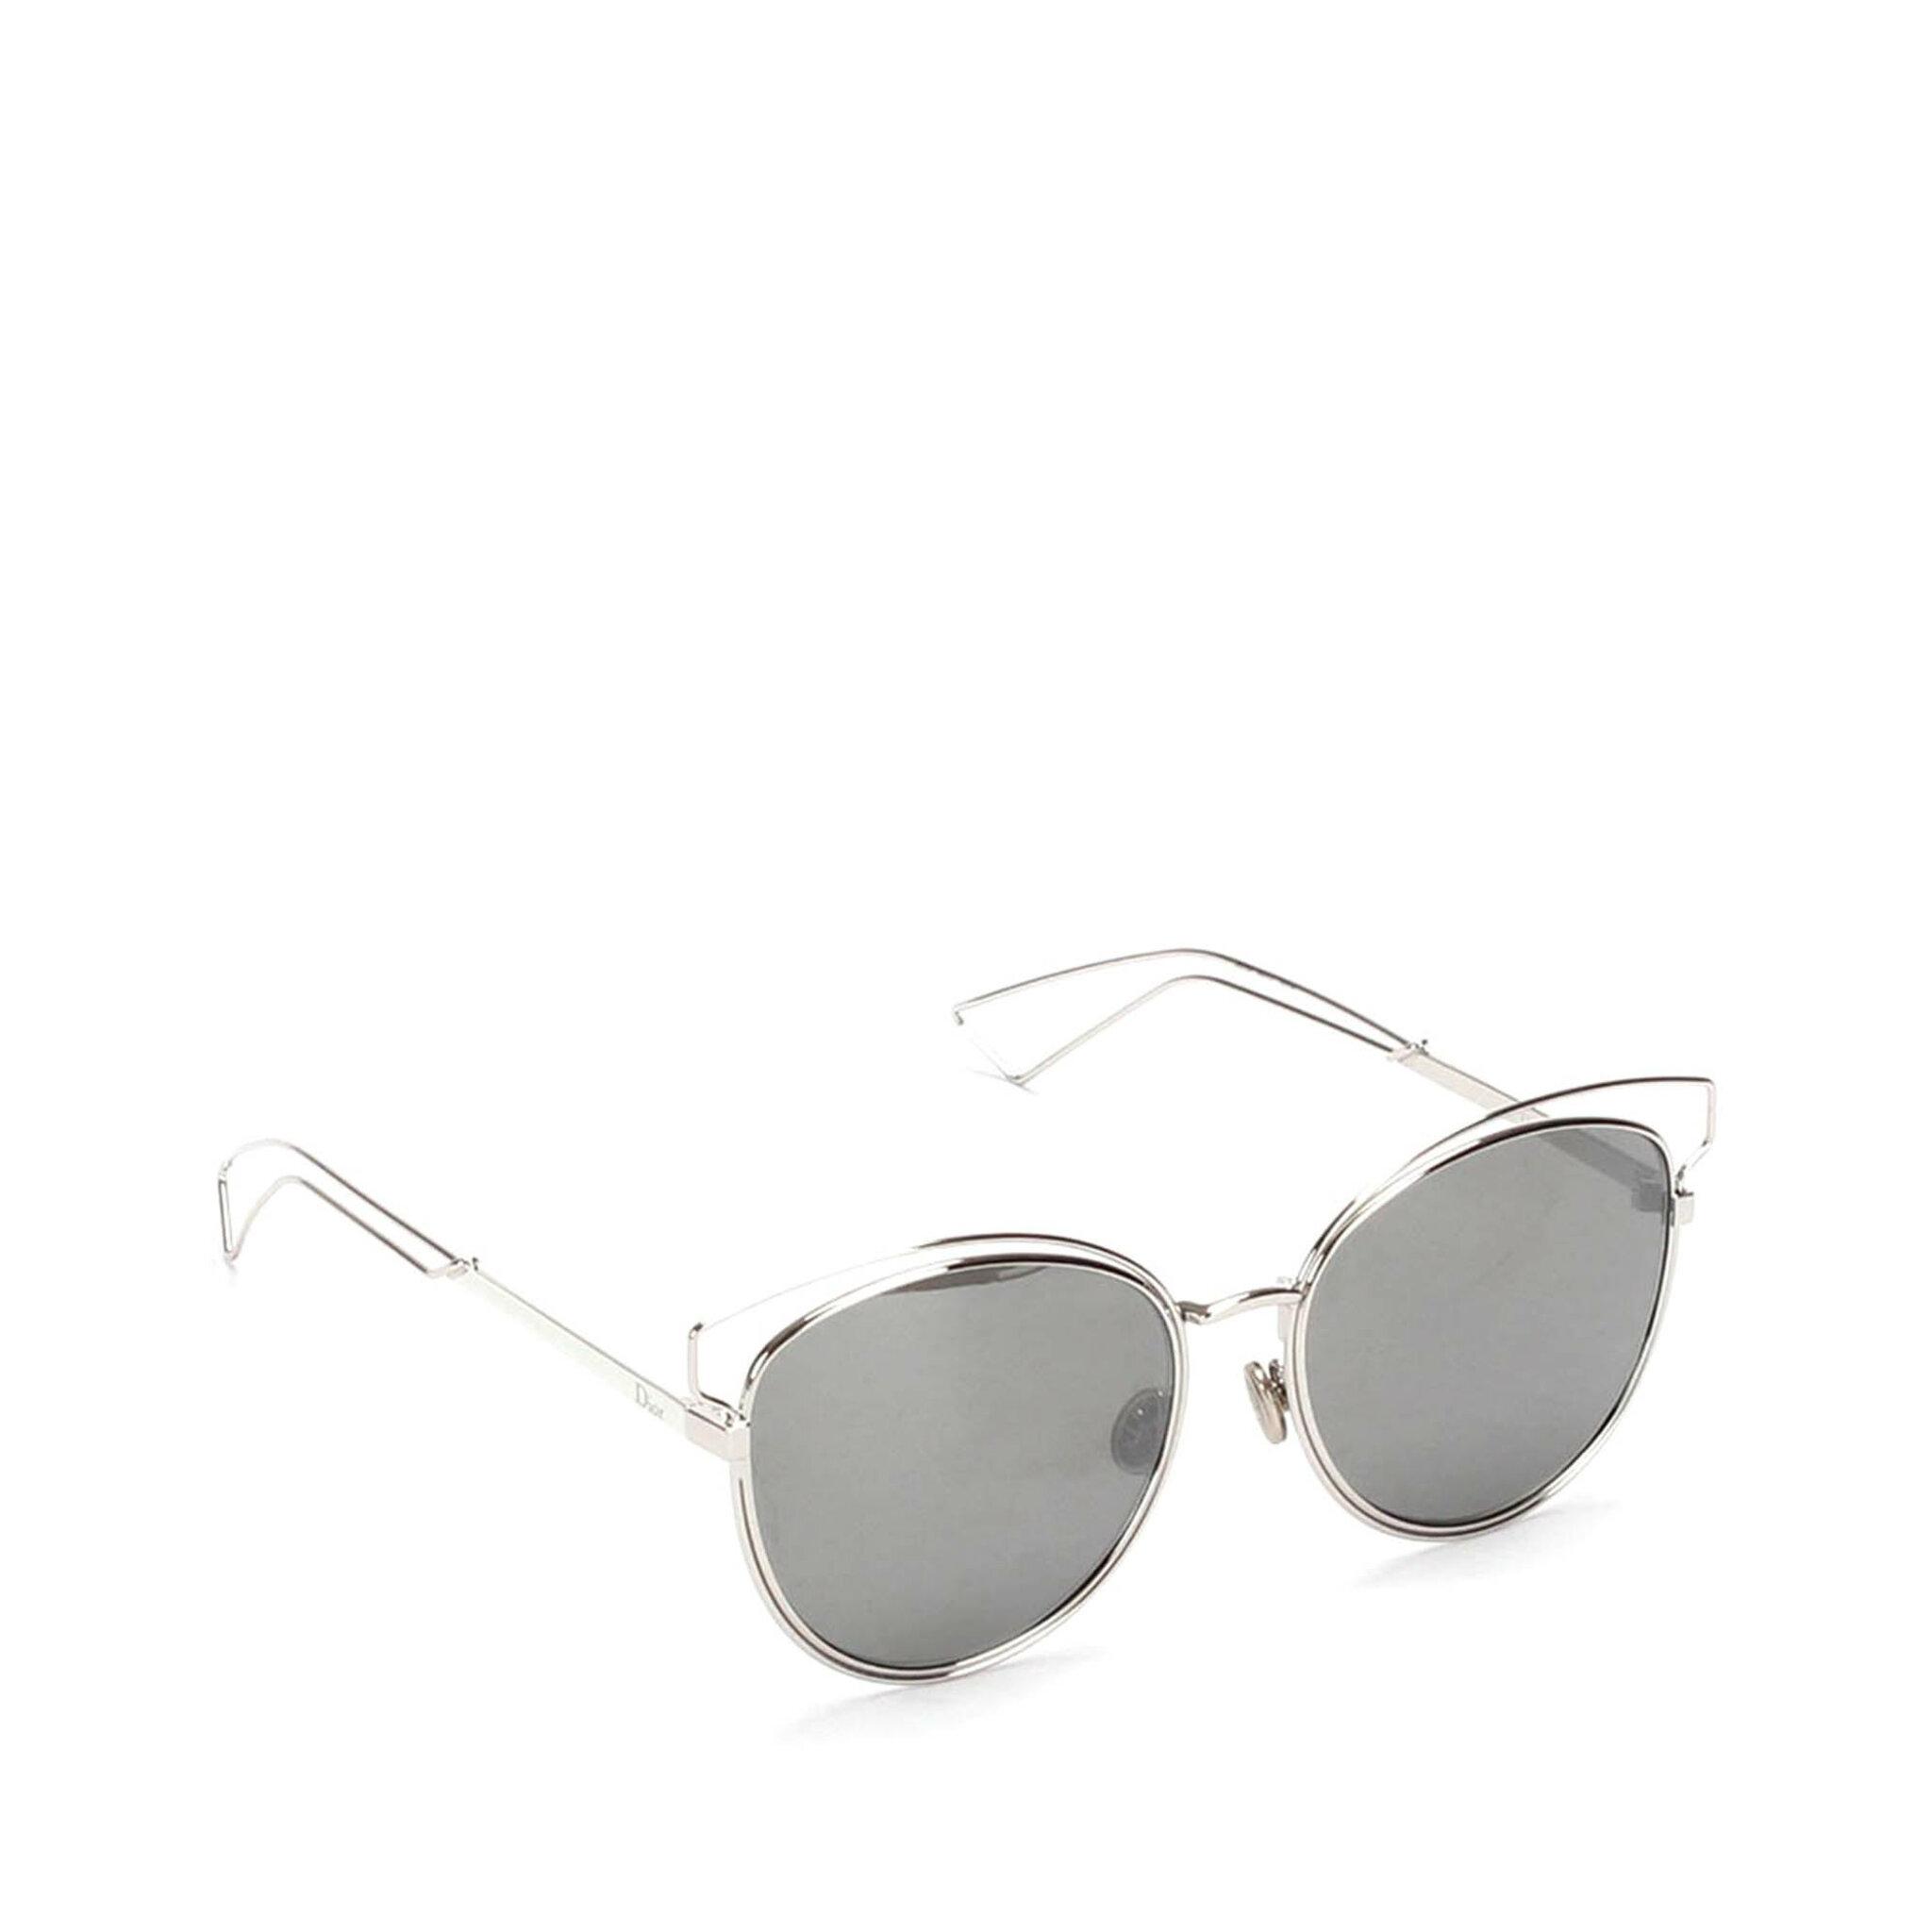 Dior Aviator Tinted Sunglasses, ONESIZE